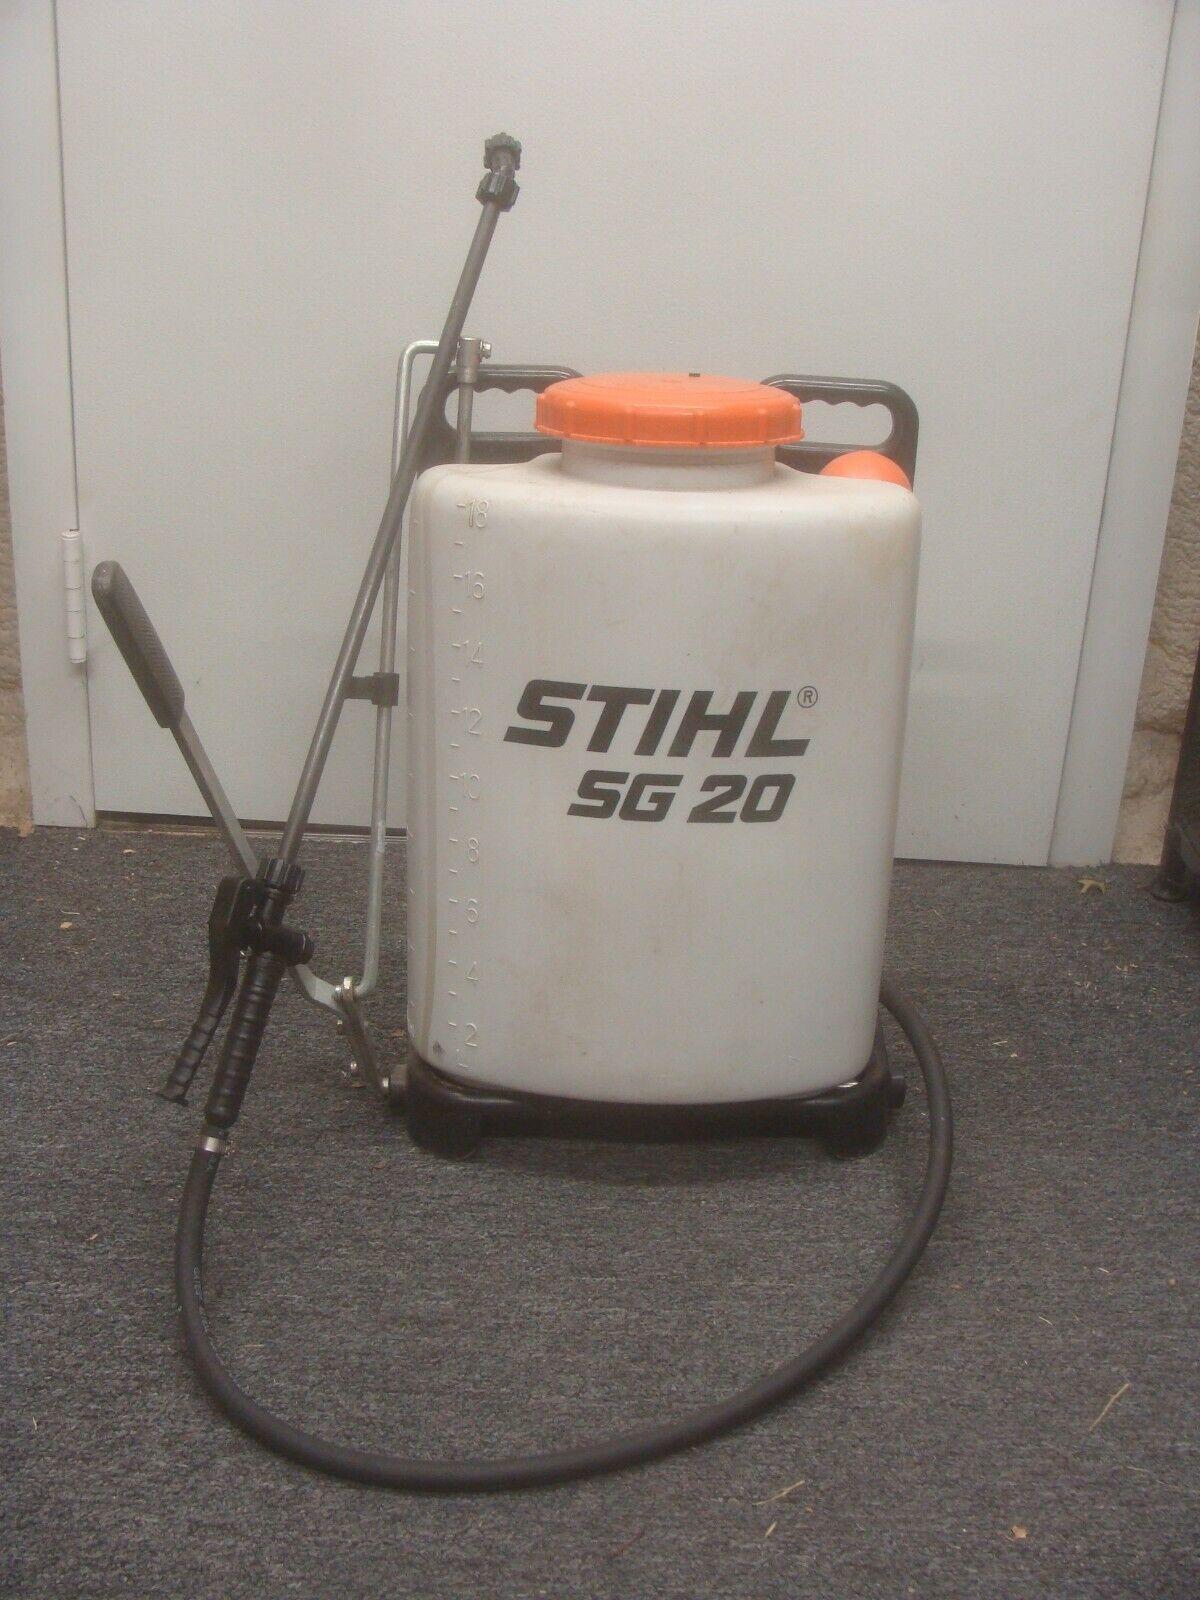 Stihl Sg20 Backpack Sprayer For Sale Online Ebay